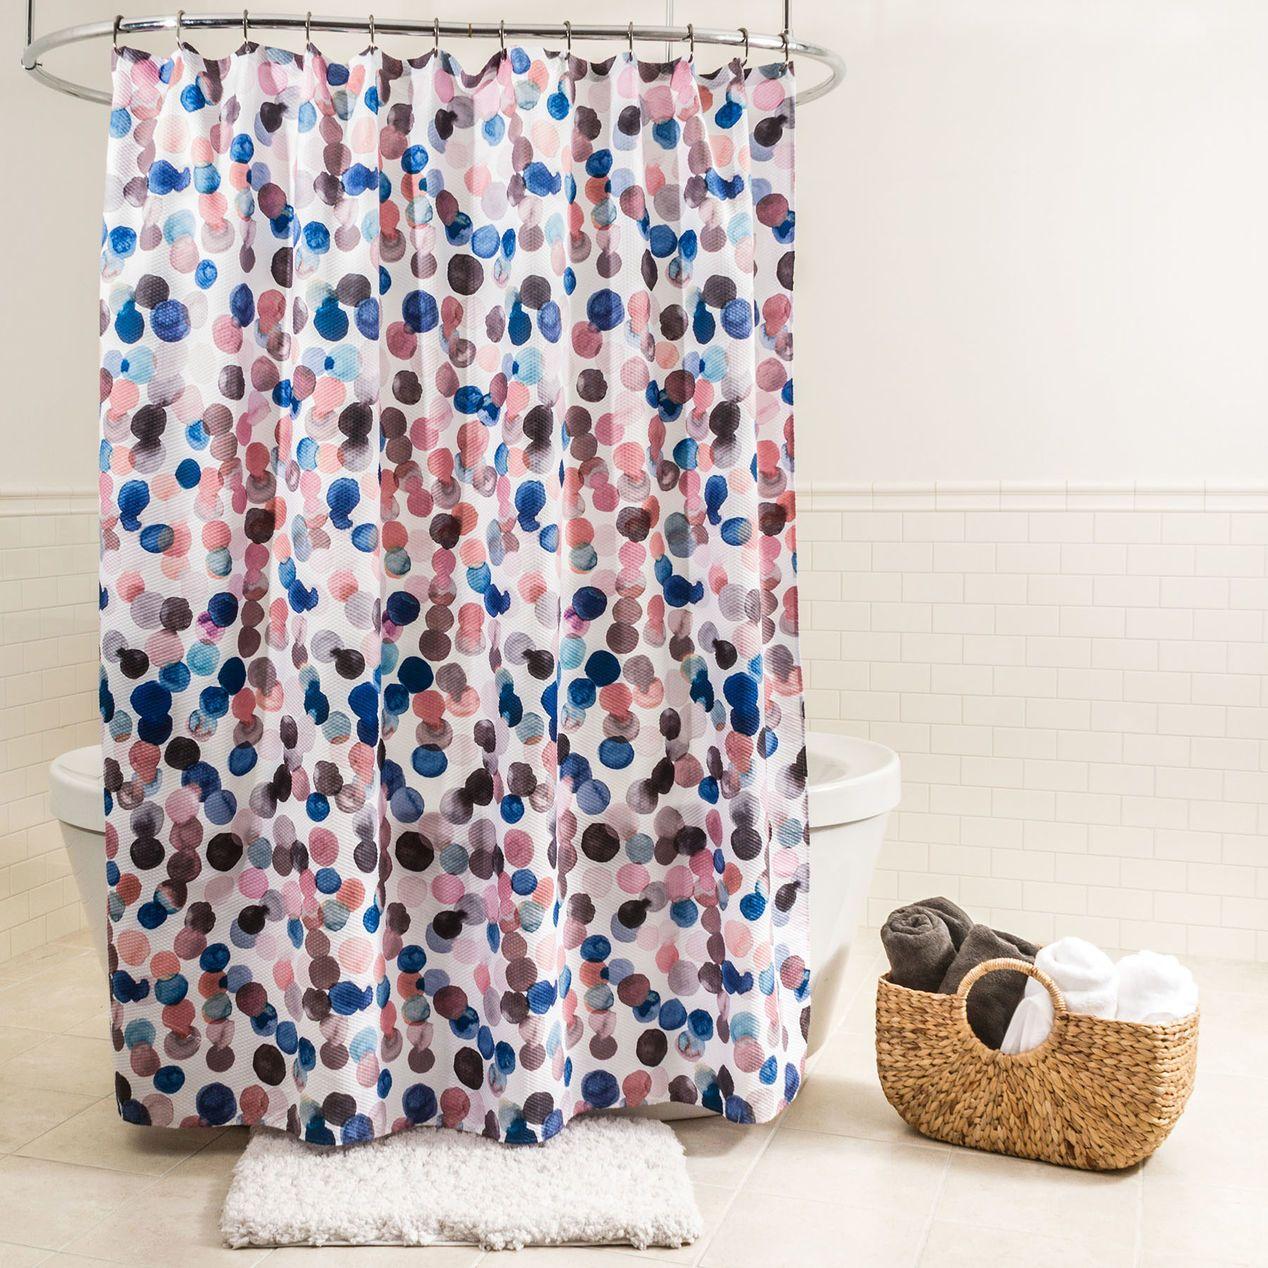 Multicolored Splash Dots Fabric Shower Curtain Fabric Shower